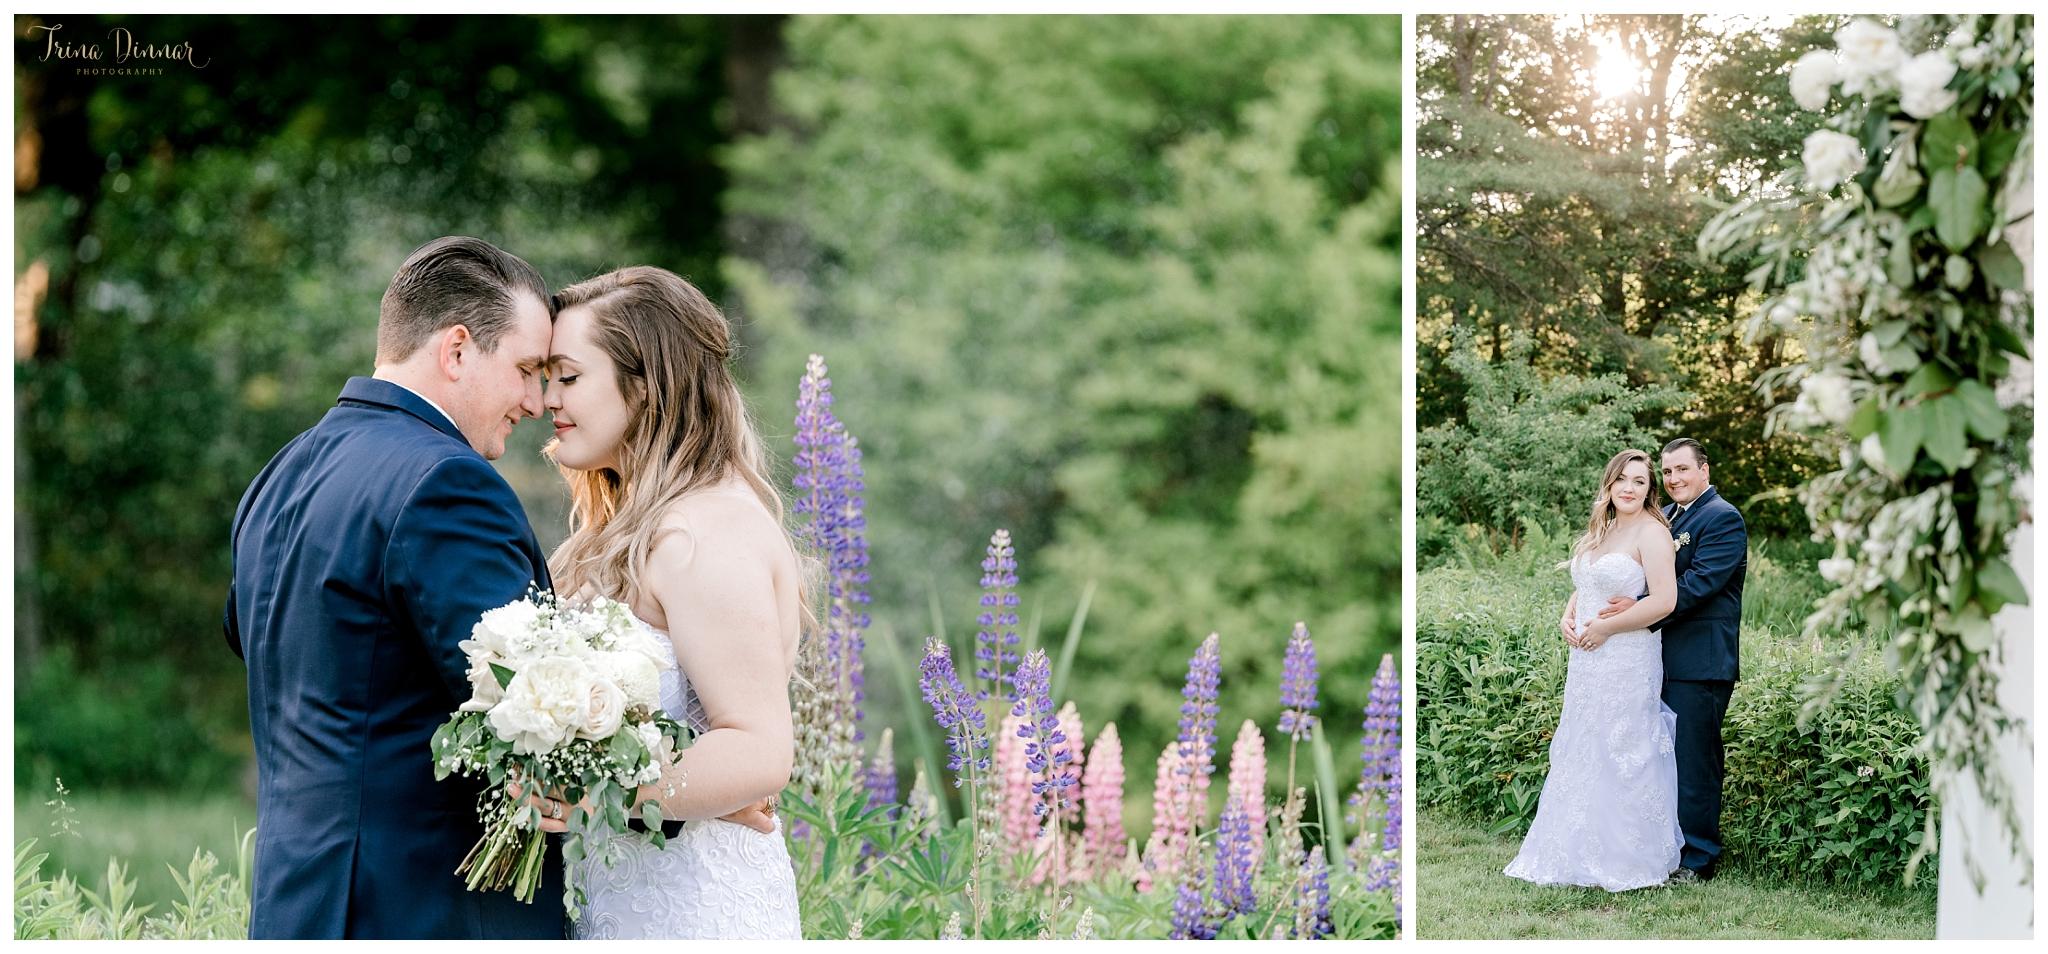 The 1812 Farm Bristol Maine Wedding by Trina Dinnar Photography